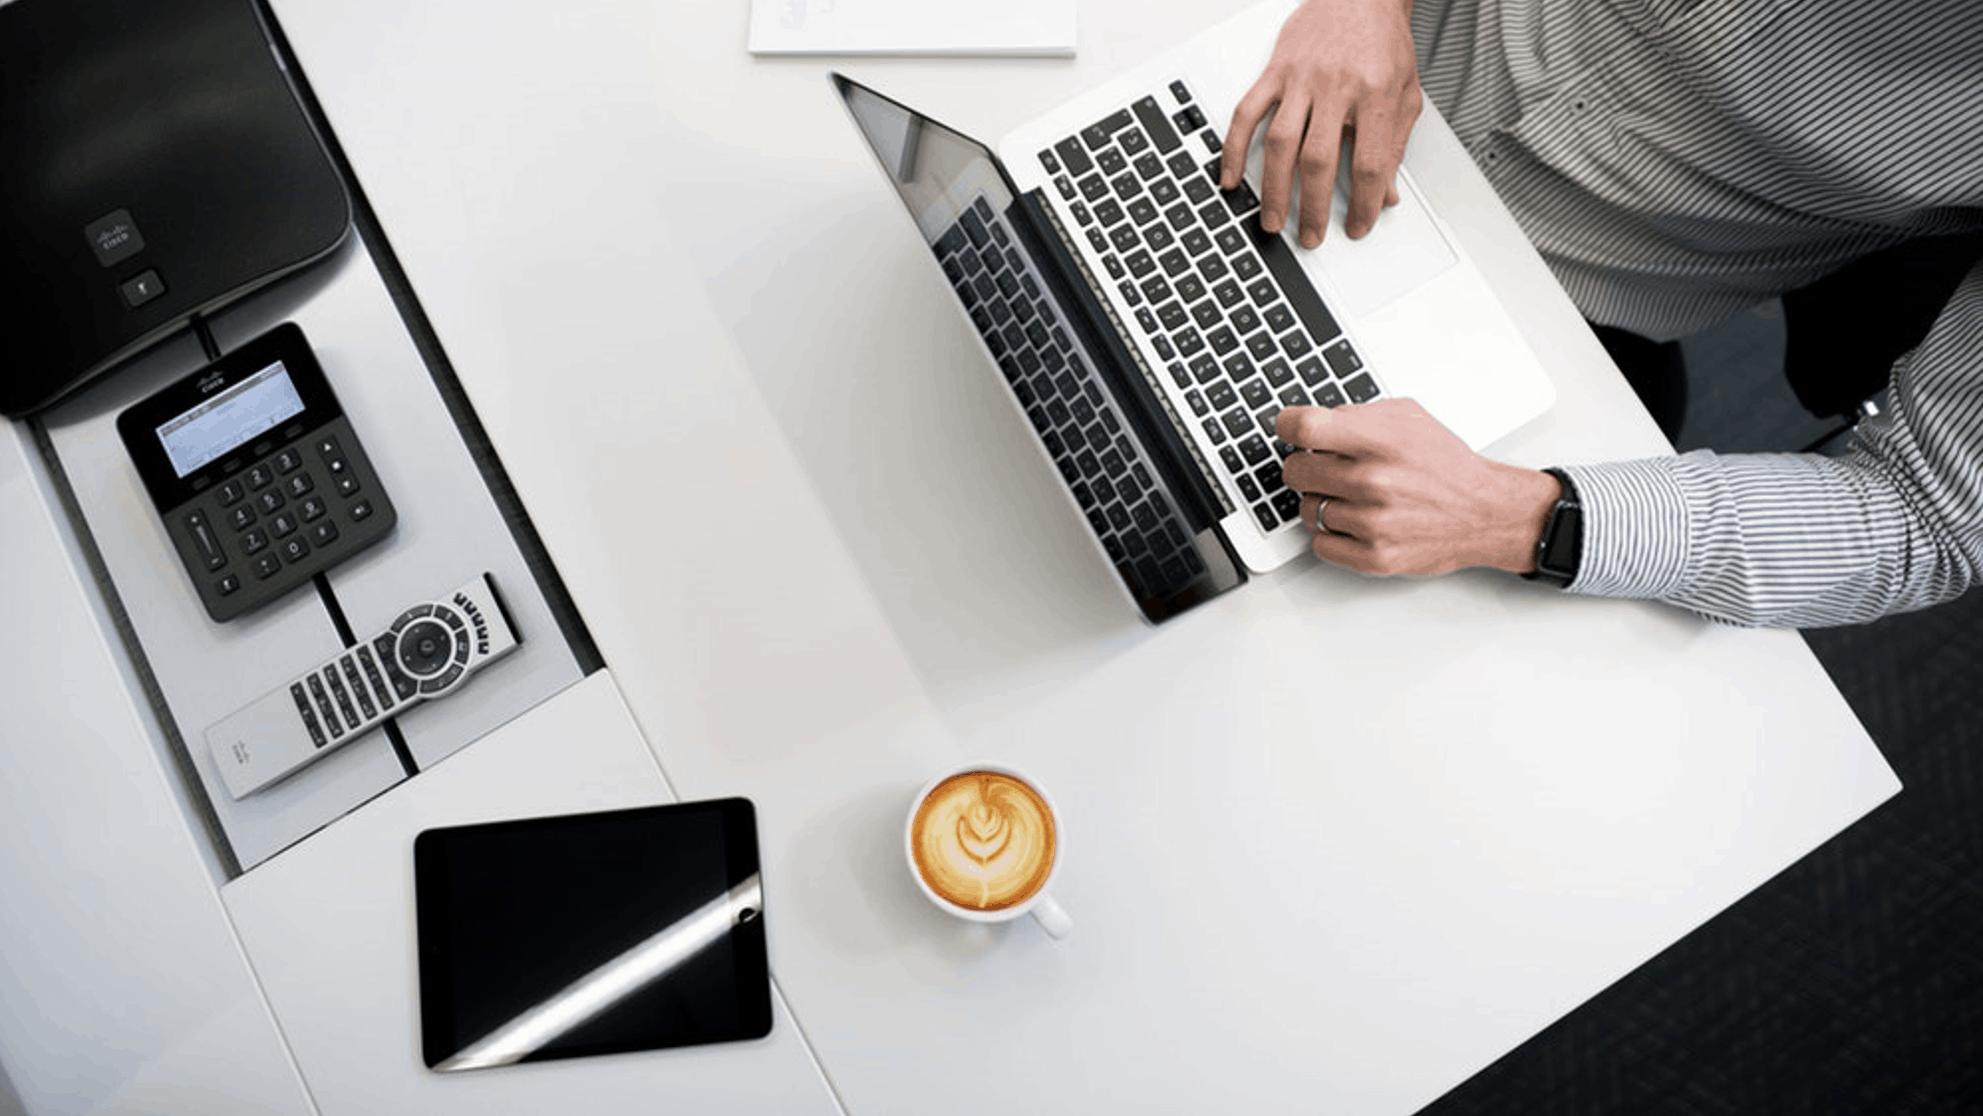 SCCM Office365 ProPlus 64 bit Architecture Change